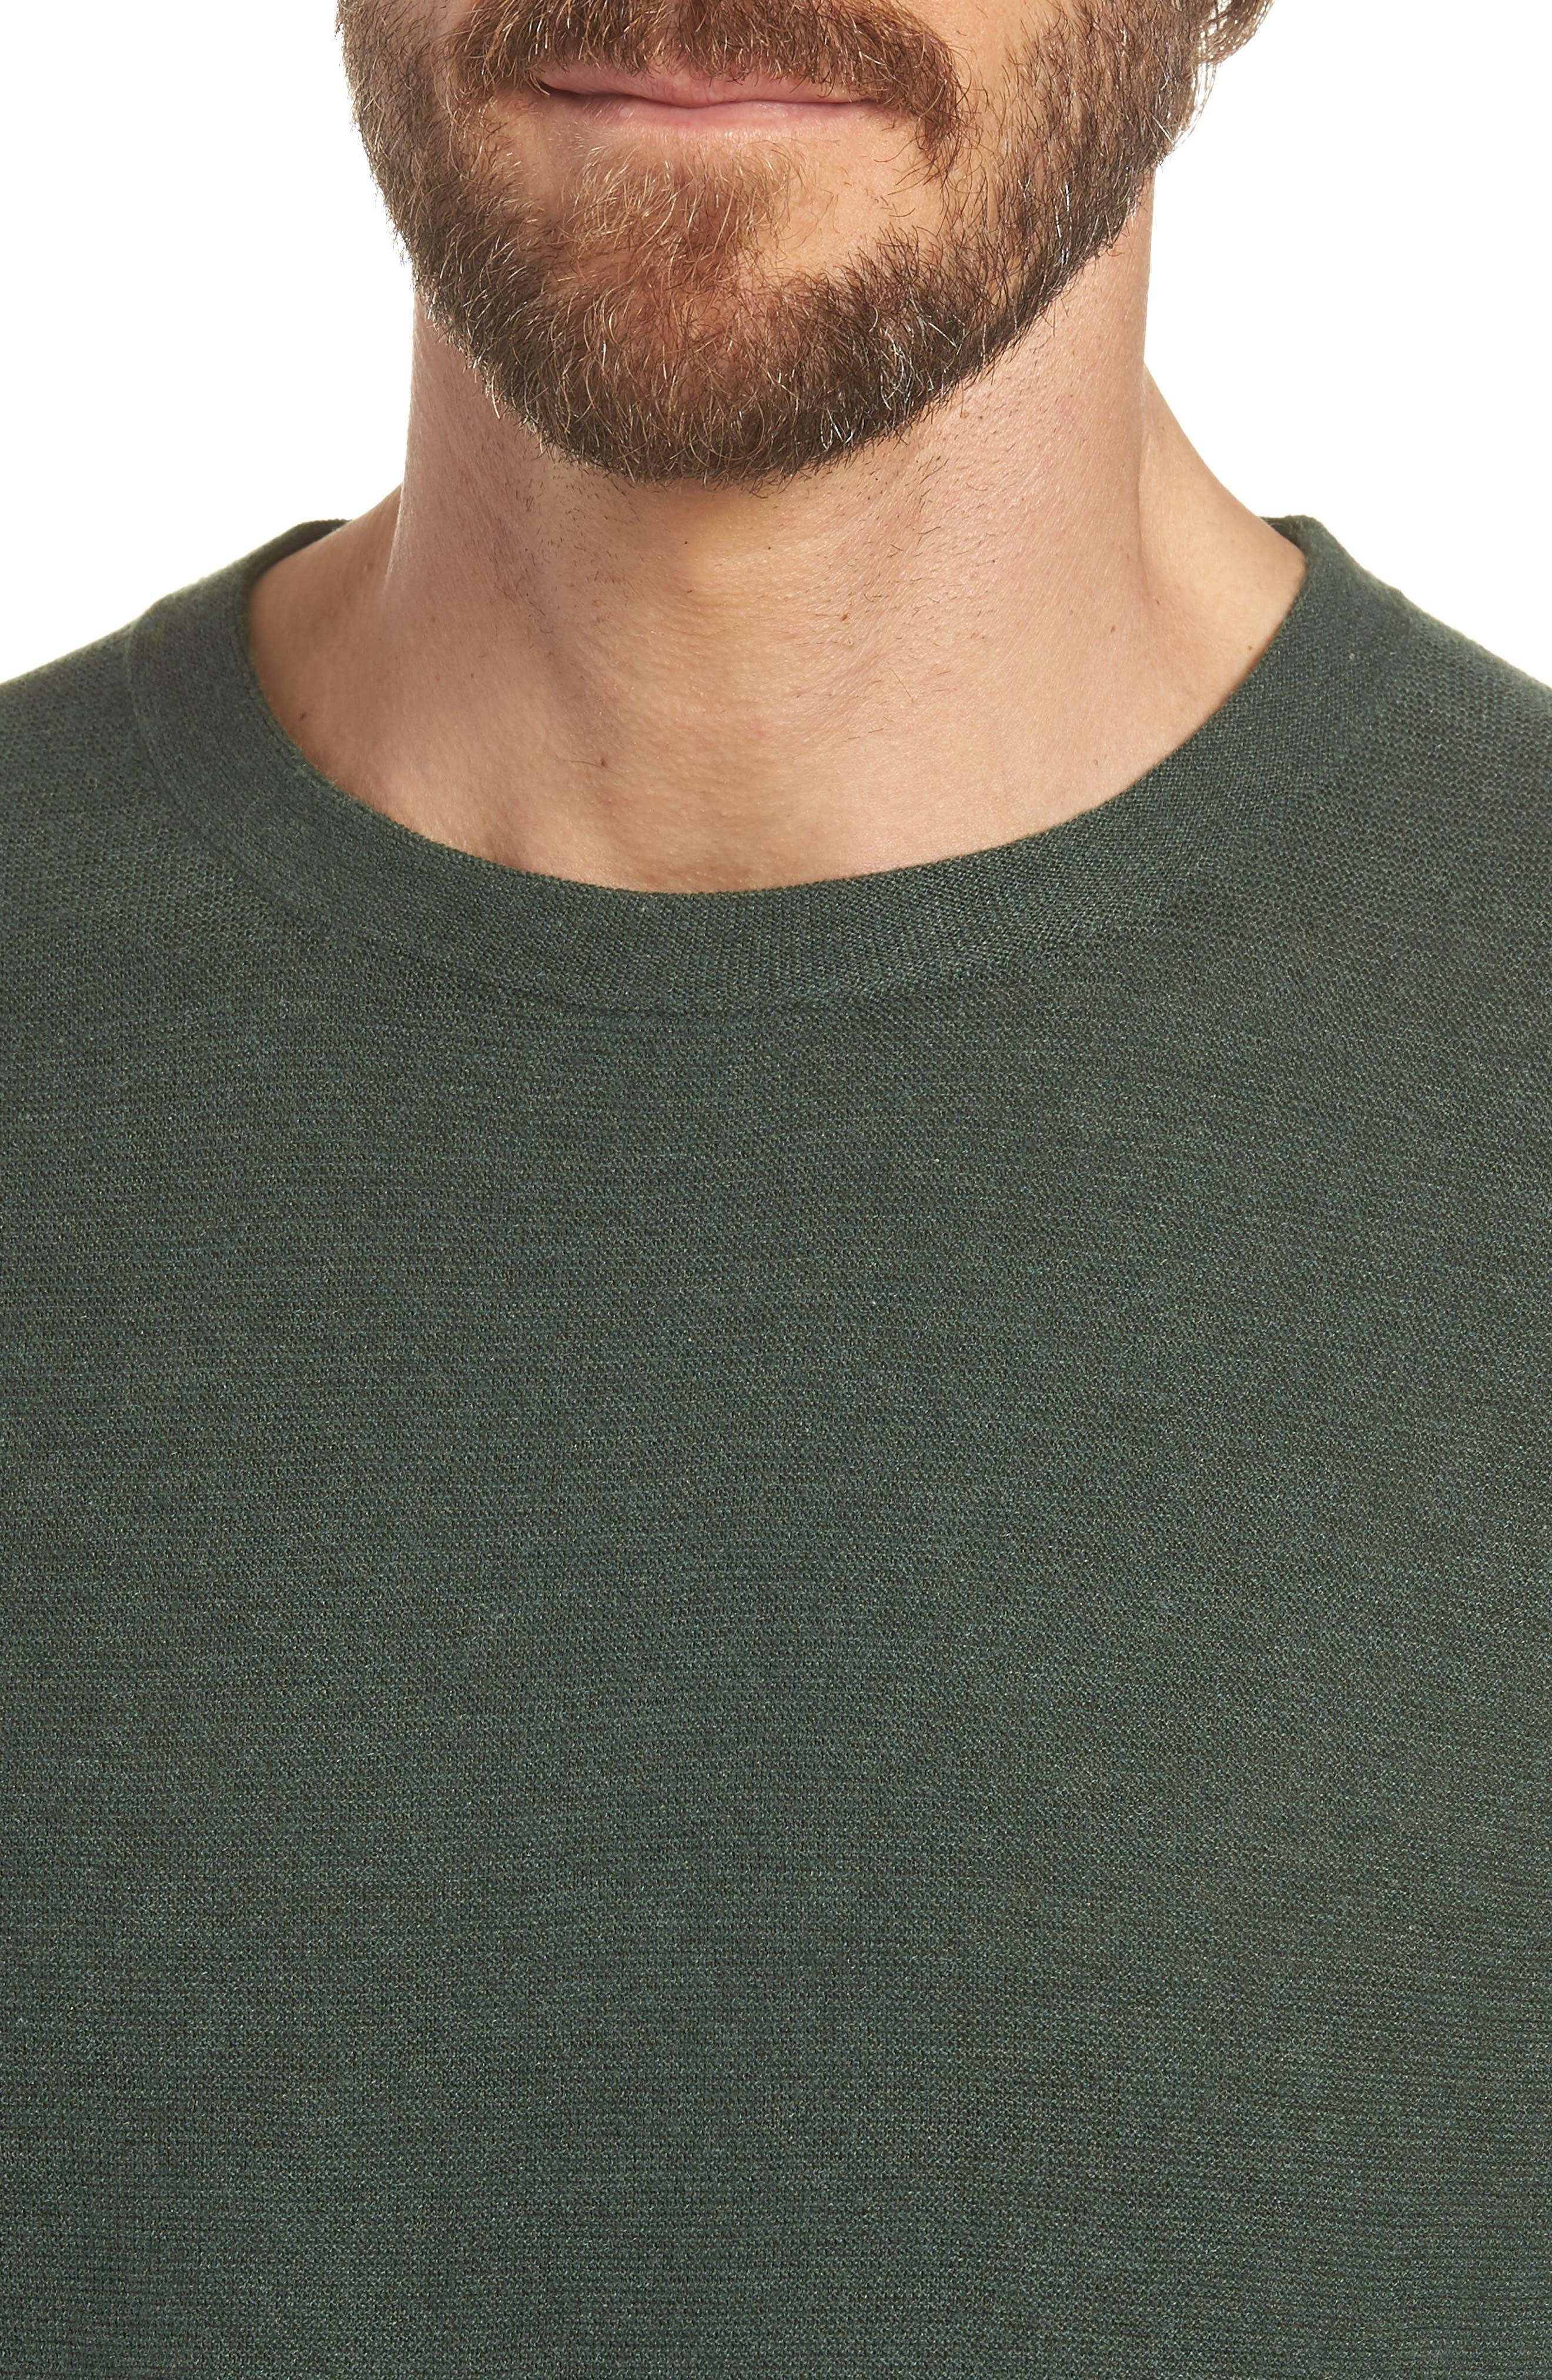 Slim Fit Crewneck Sweater,                             Alternate thumbnail 4, color,                             300